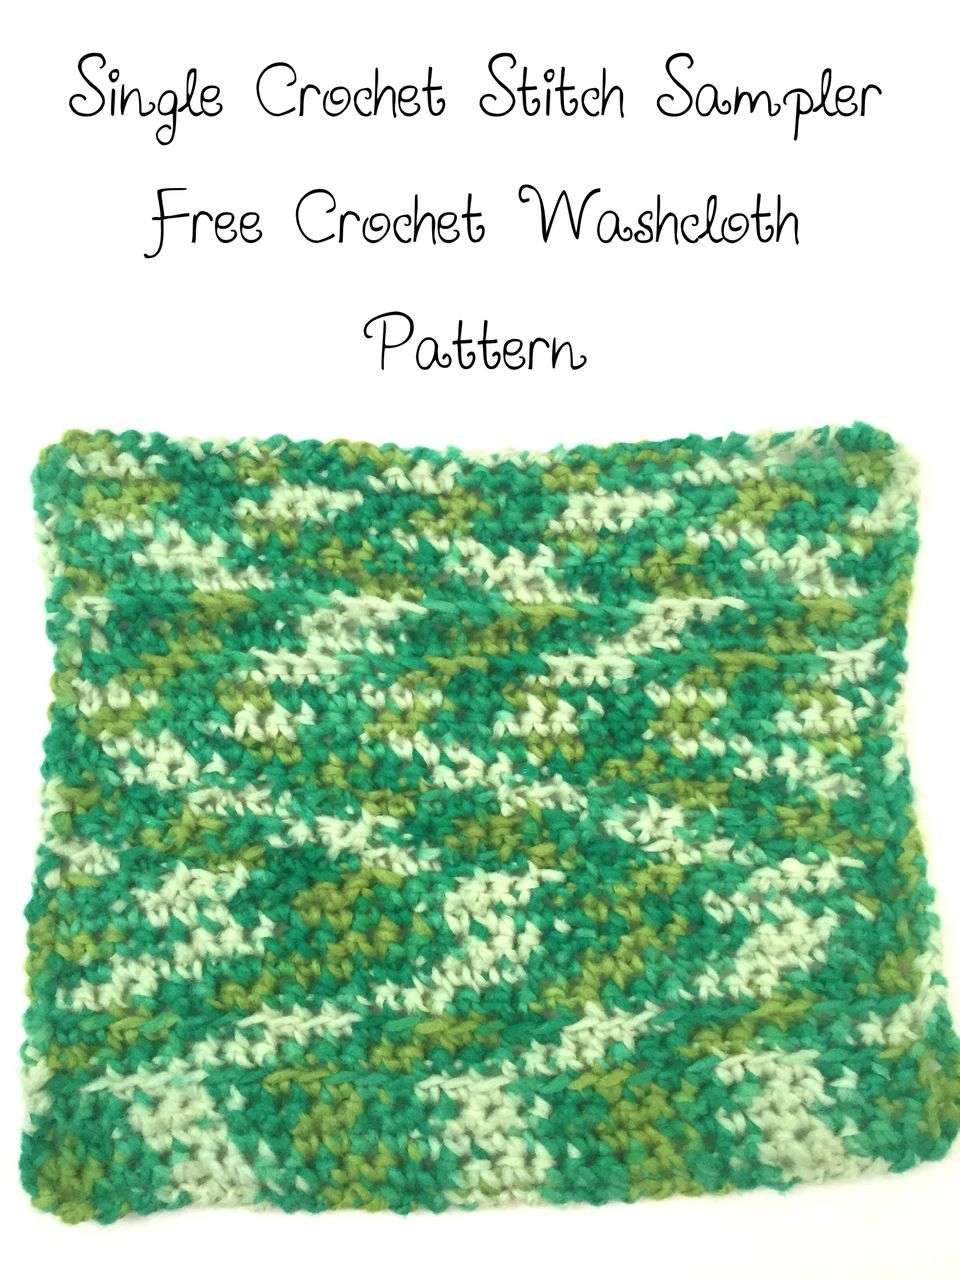 Single Crochet Stitch Sampler Free Crochet Washcloth Pattern